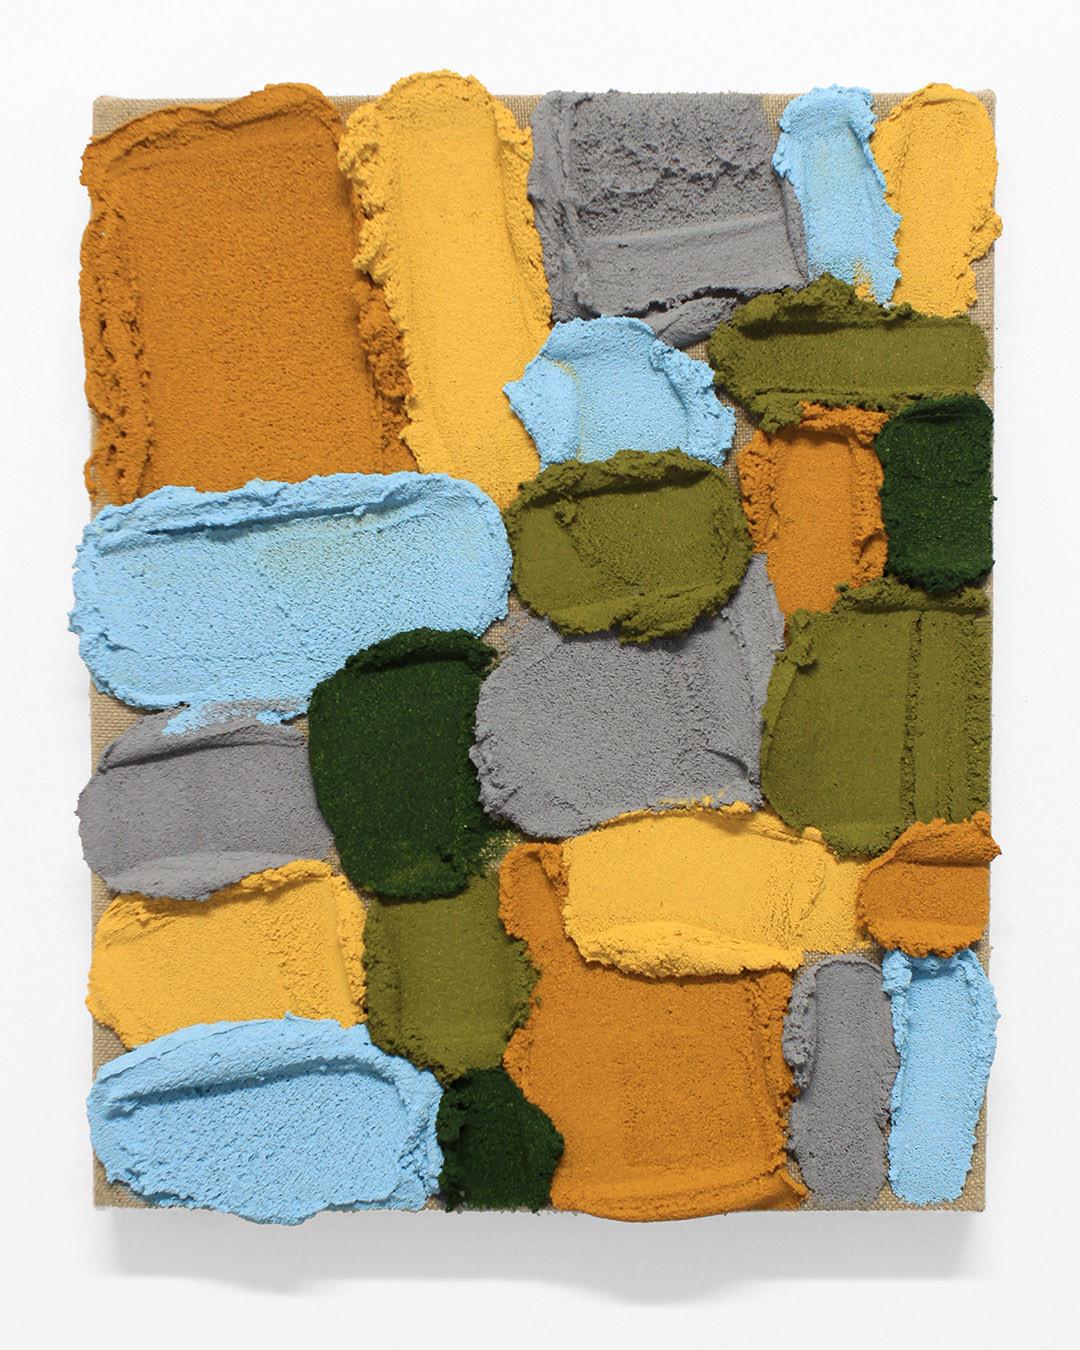 PR33, 2020. Acrylic, sand and limestone on linen. 41 x 33 cm.